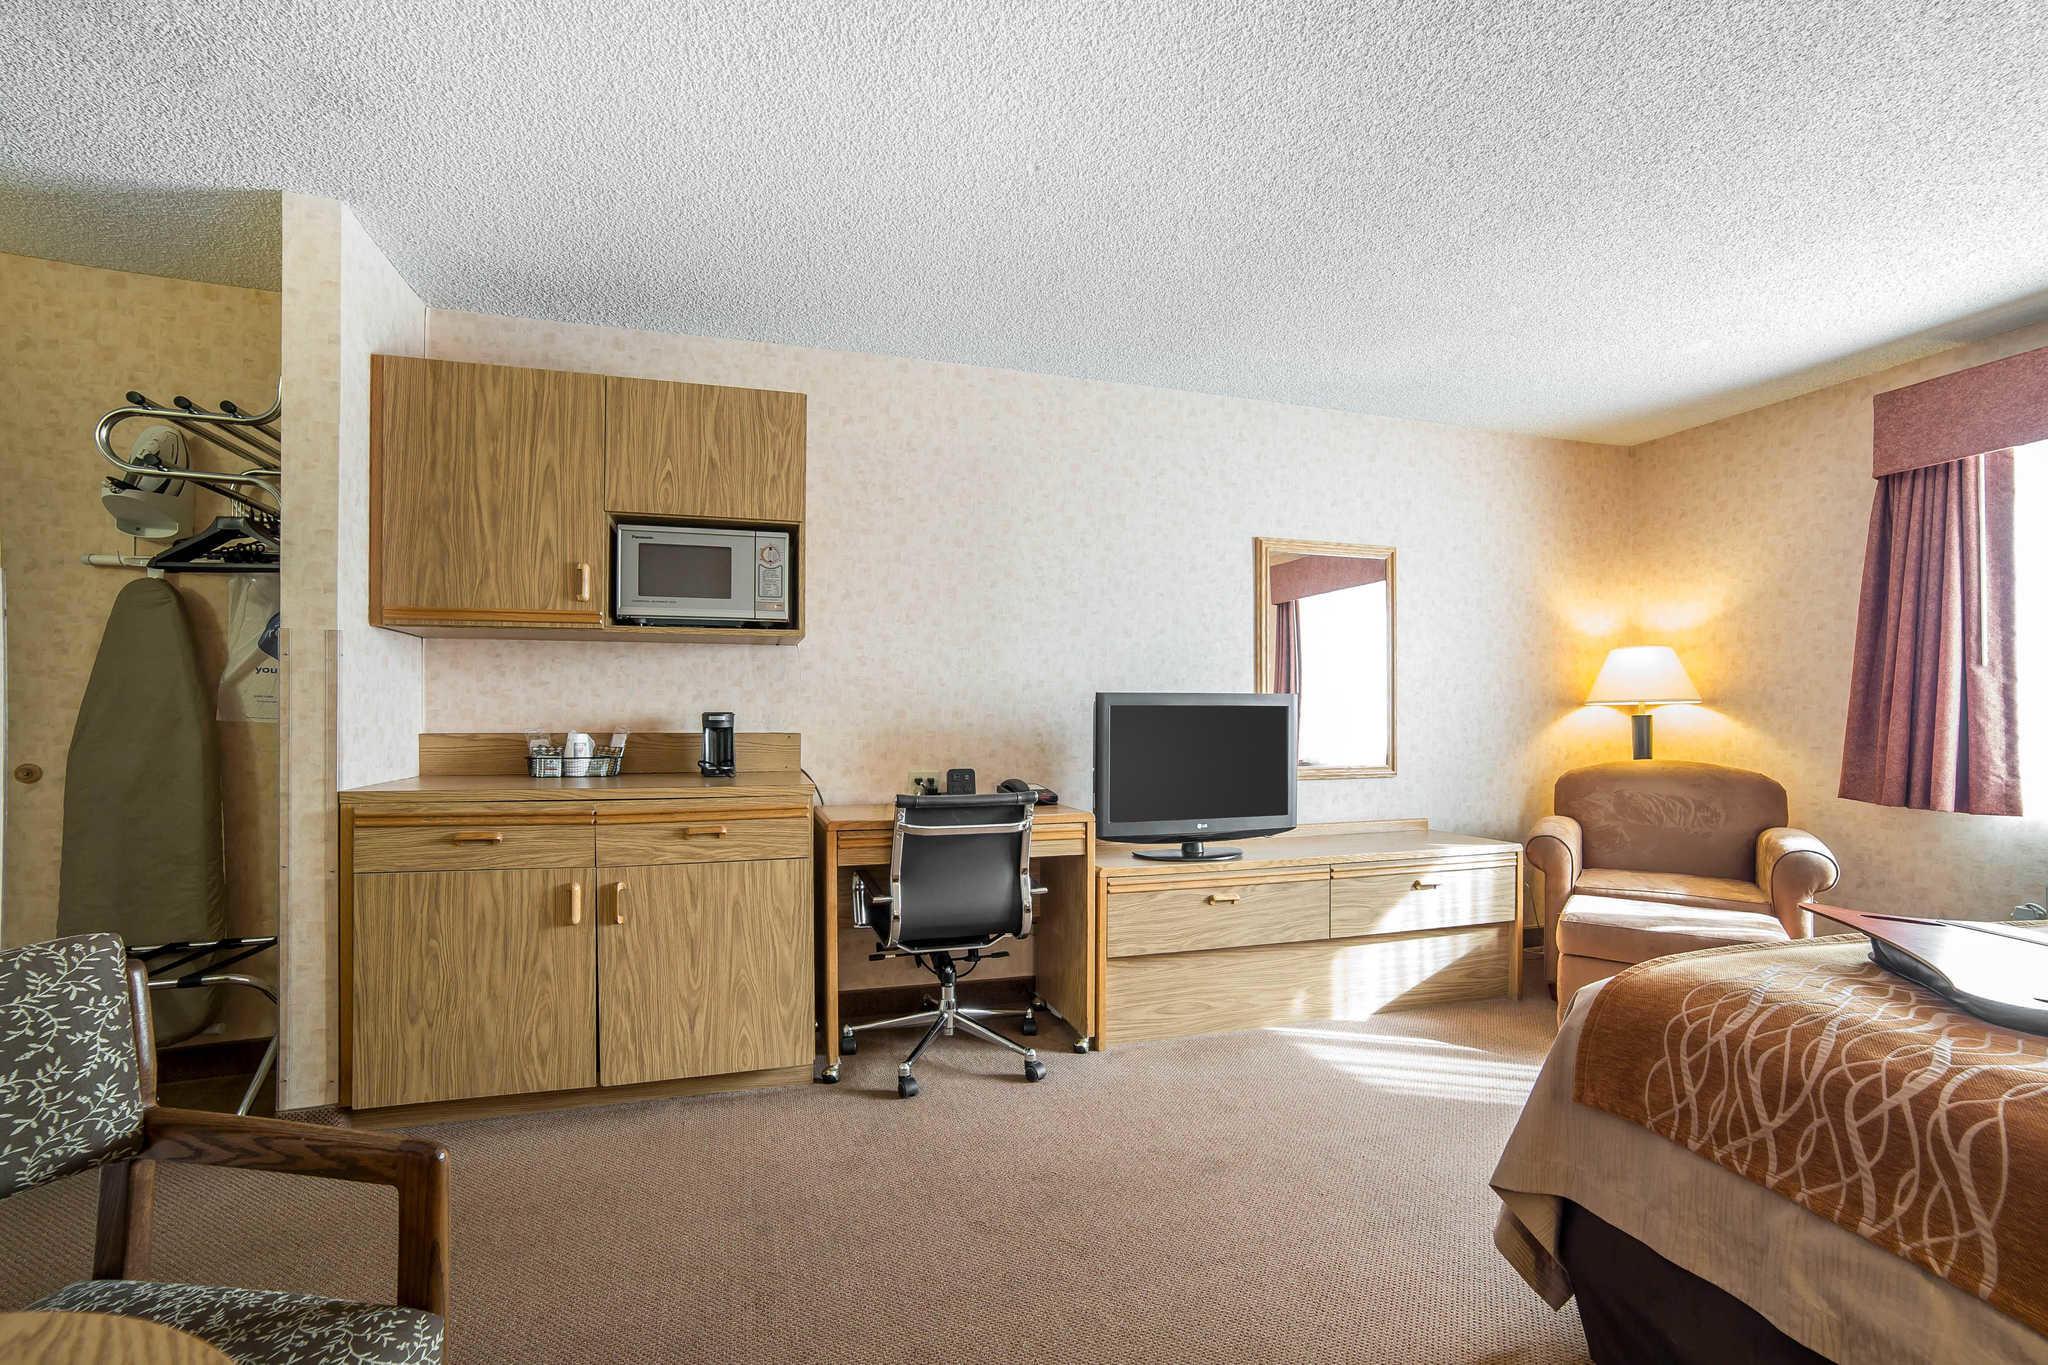 Quality Inn image 5